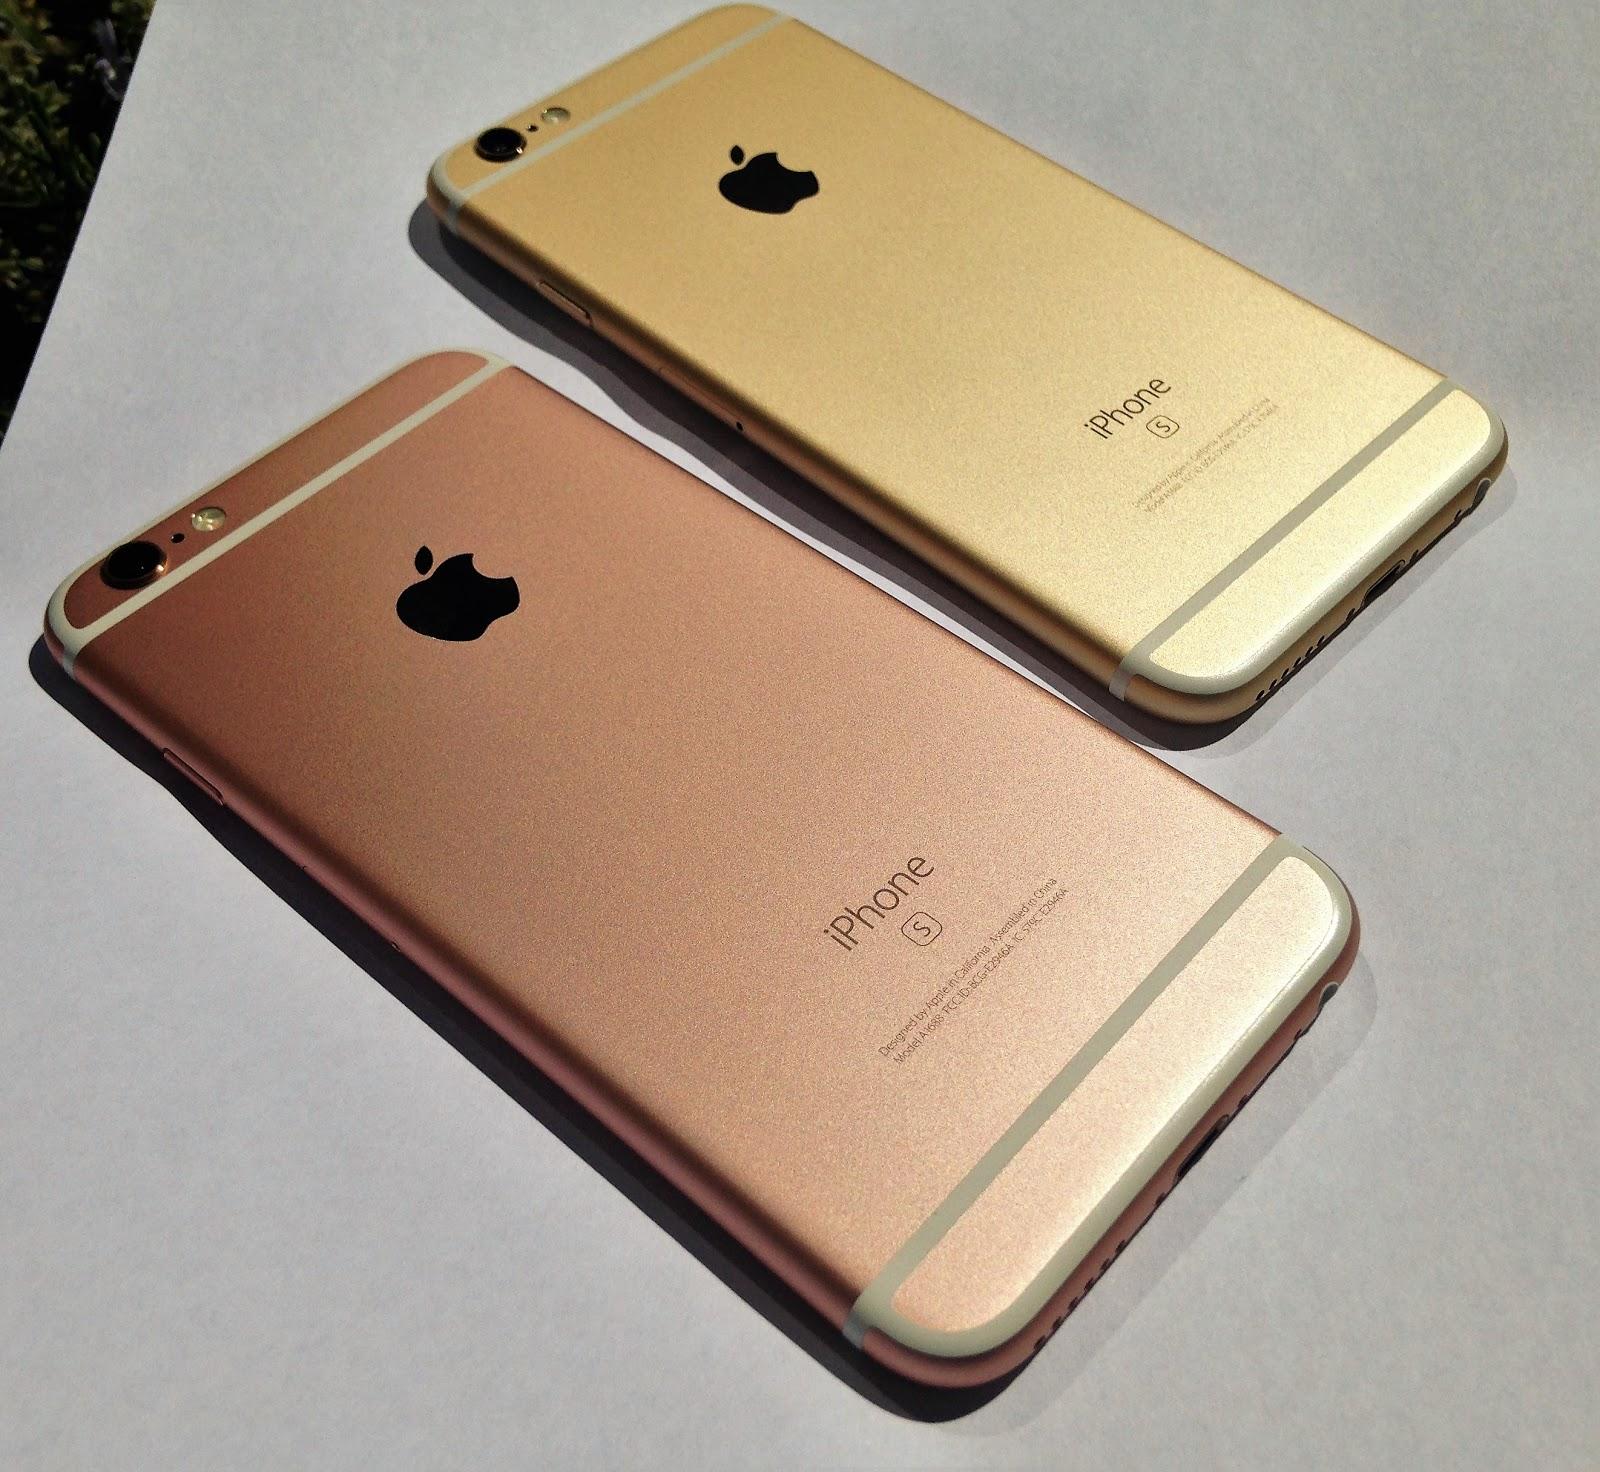 pedram pourmand iphone 6s gold vs rose gold. Black Bedroom Furniture Sets. Home Design Ideas